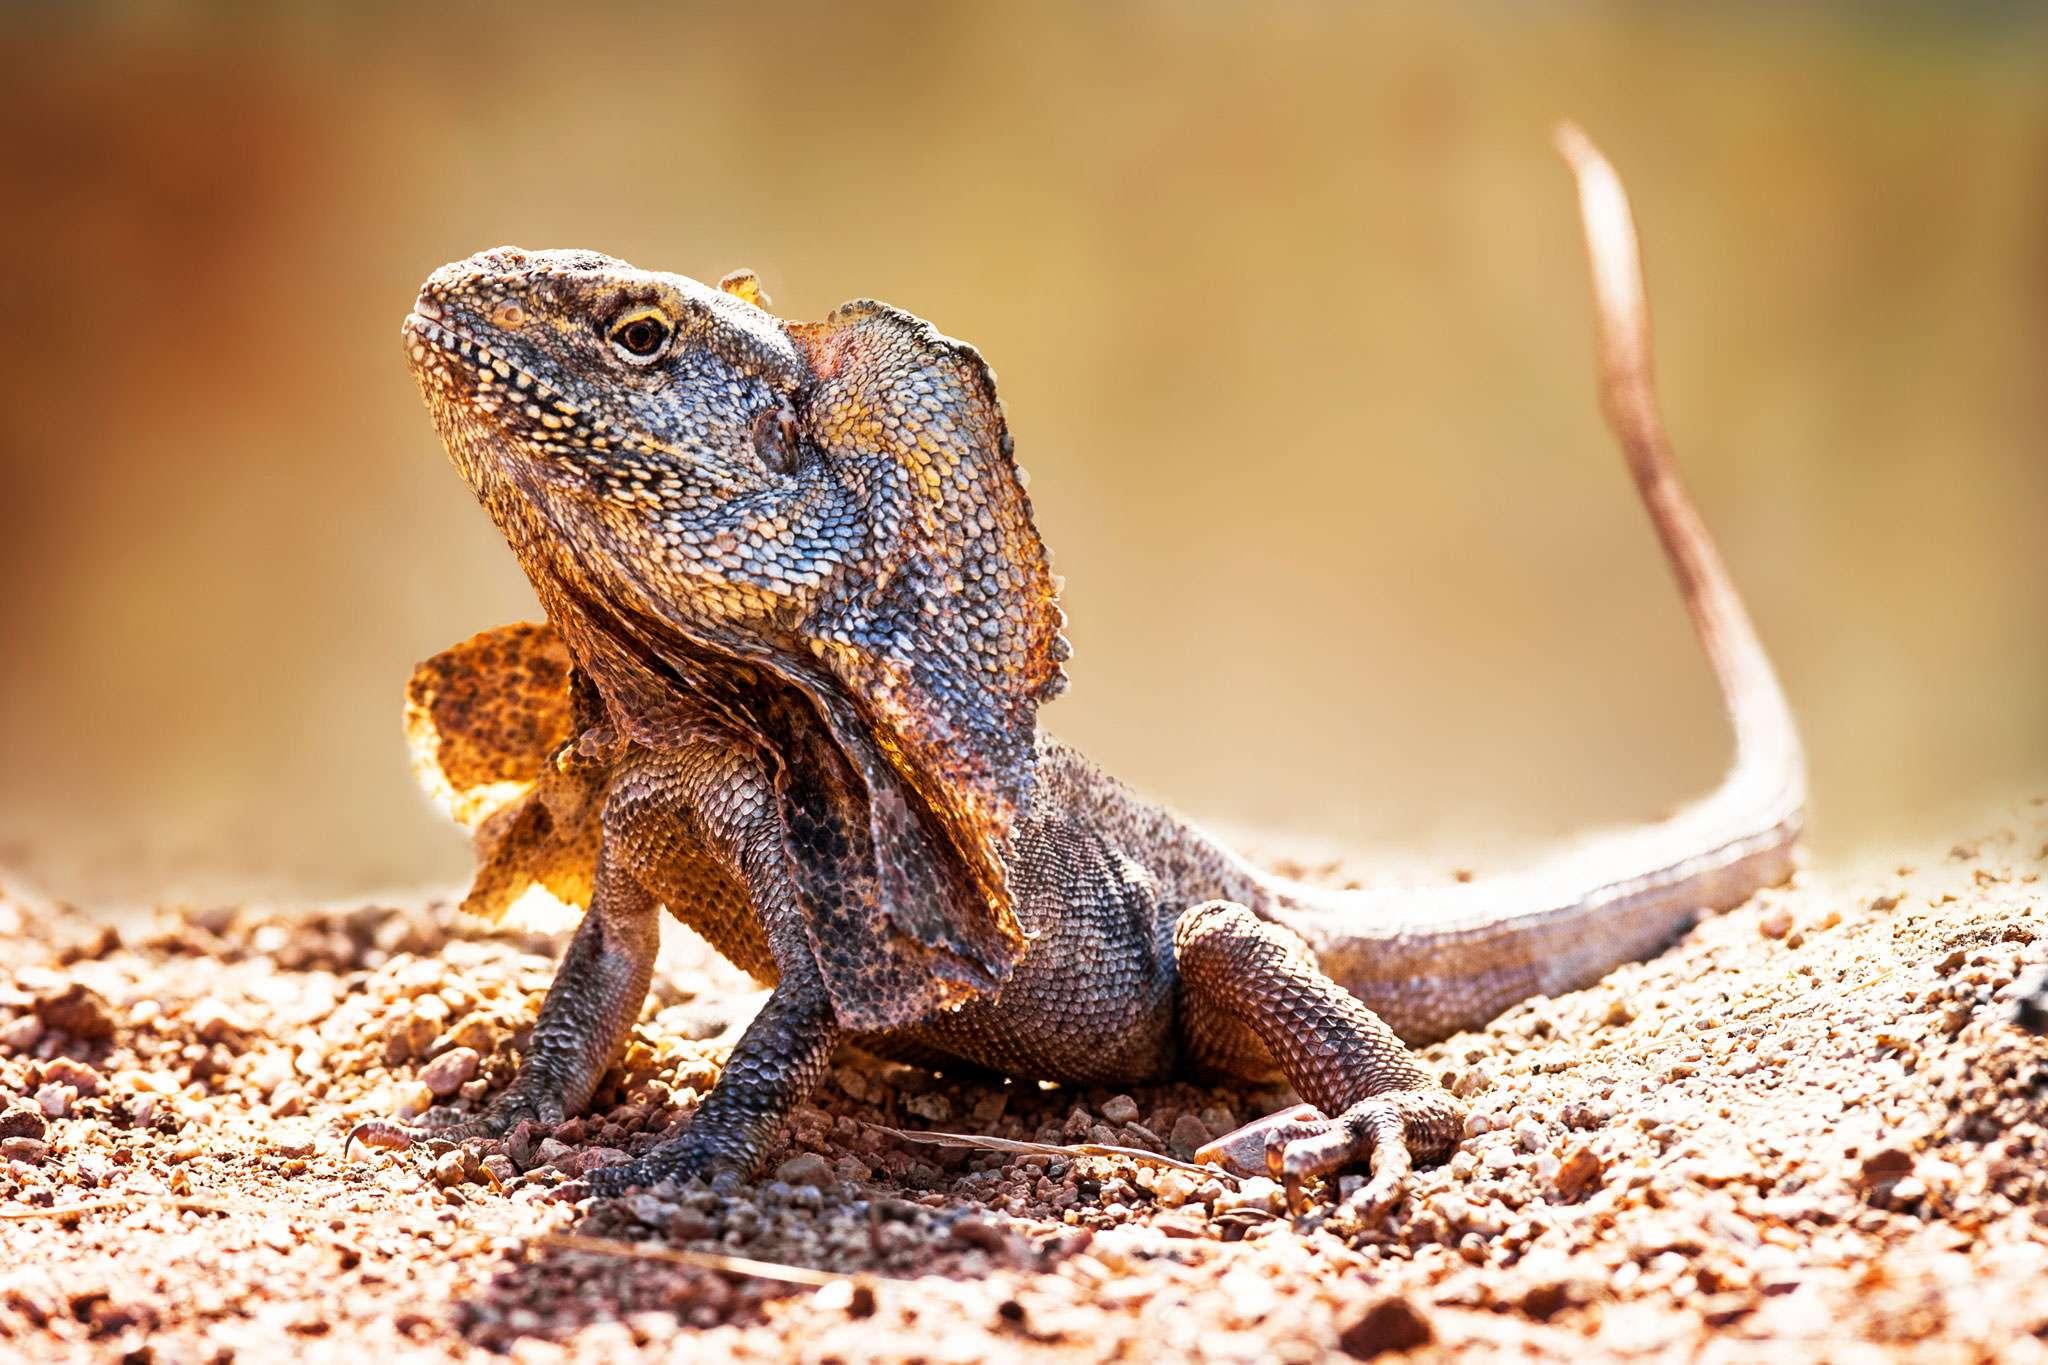 Frilled Neck Lizard Habitat, Diet & Reproduction - NSW